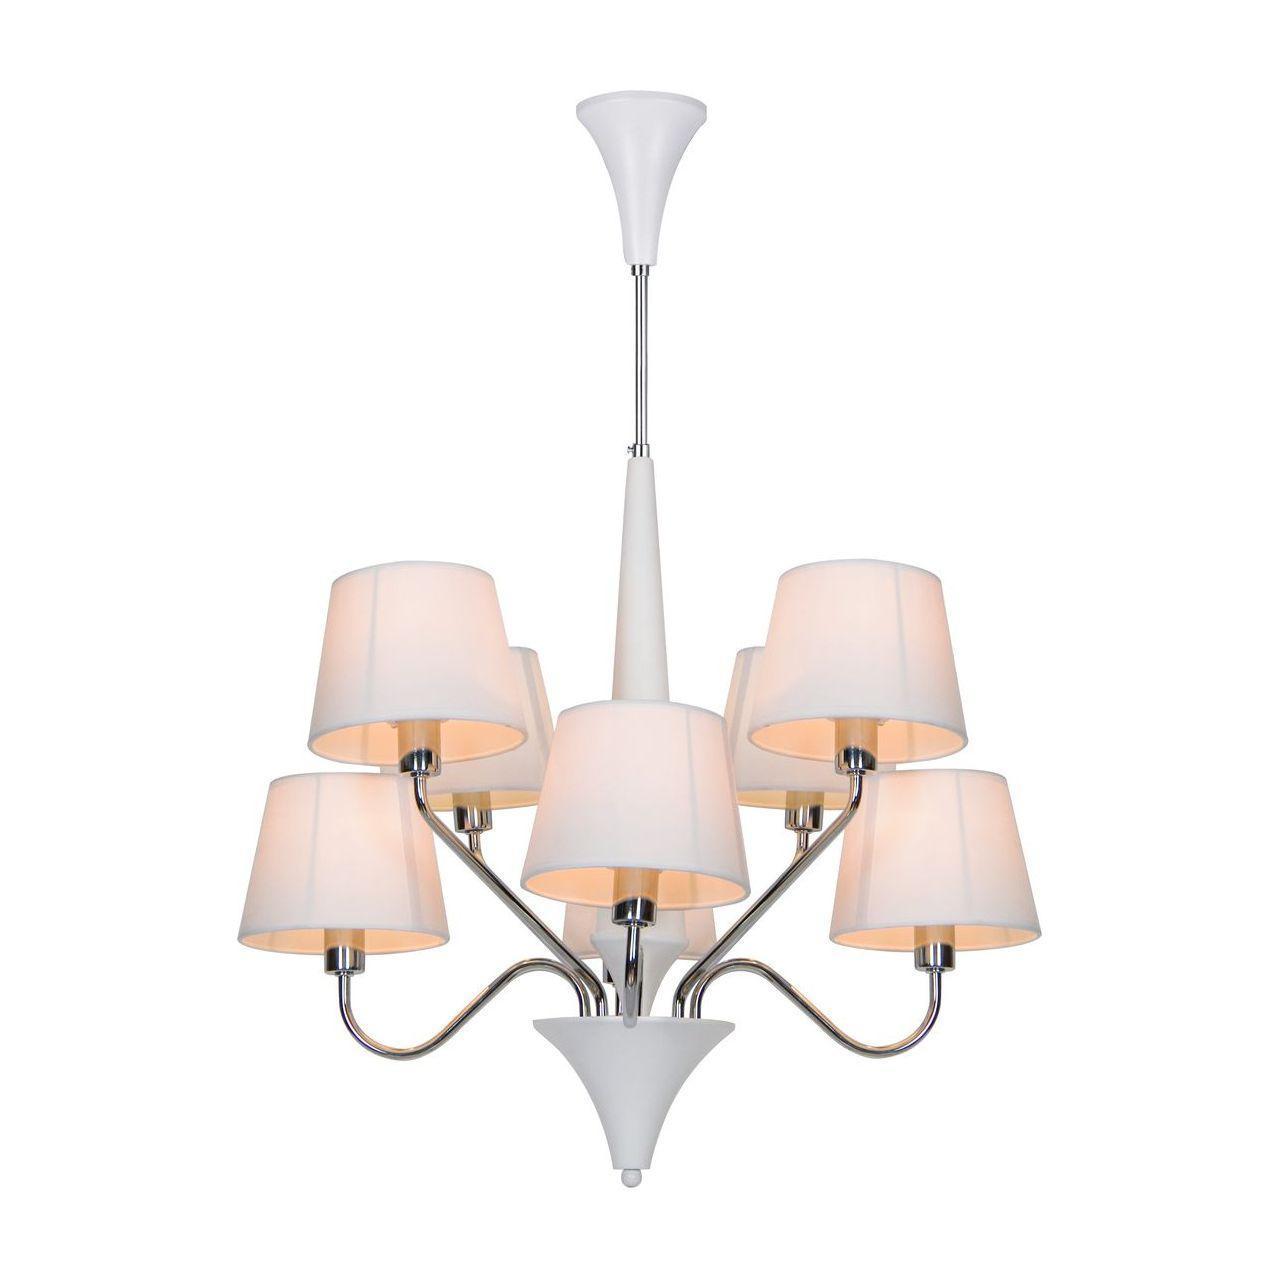 Подвесная люстра Arte Lamp A1528LM-8WH arte lamp prima a9130lm 8wh